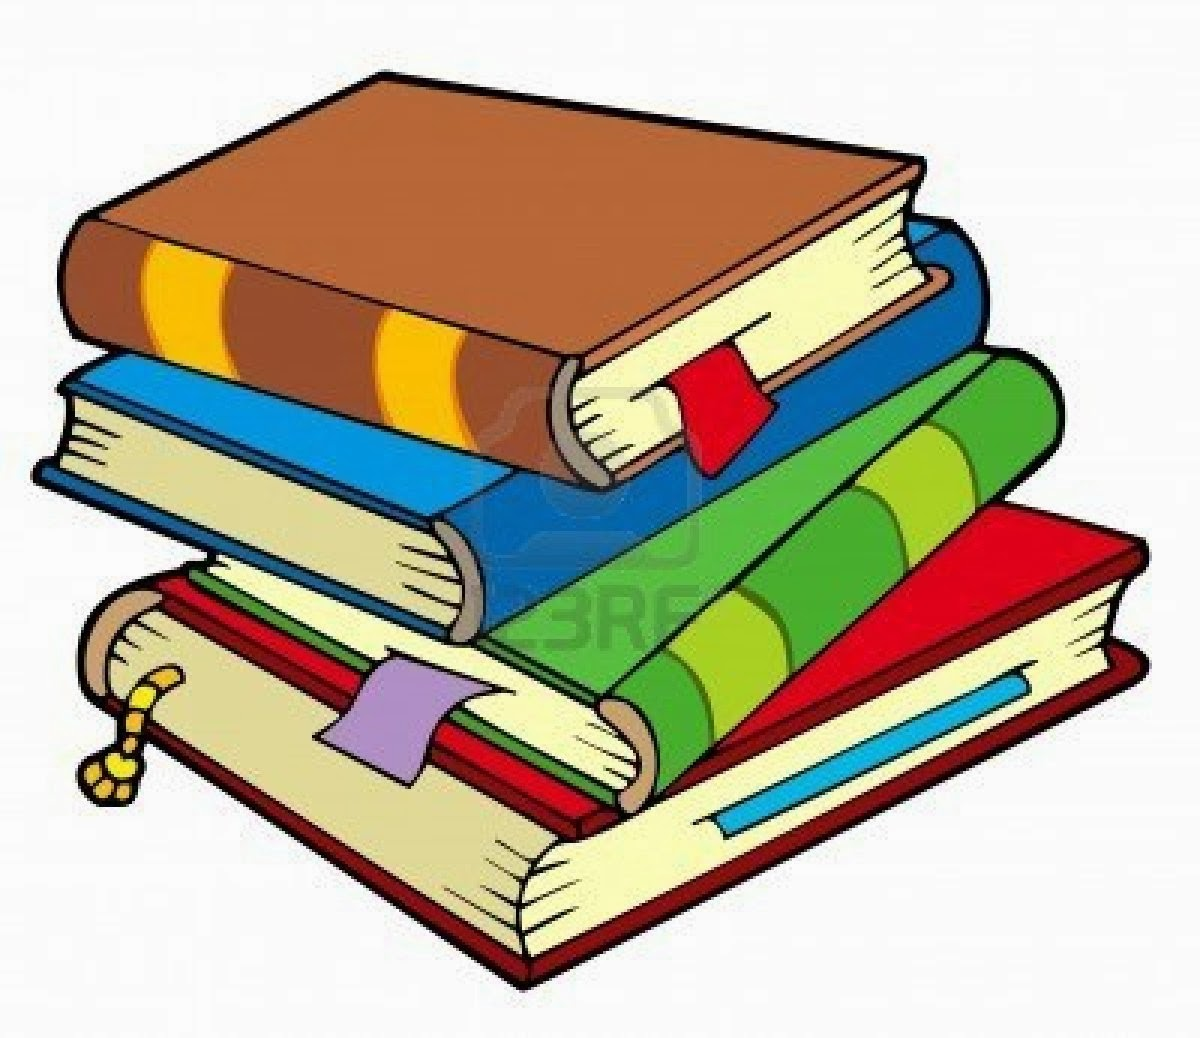 http://educacion2.com/wp-content/uploads/libros11.jpg